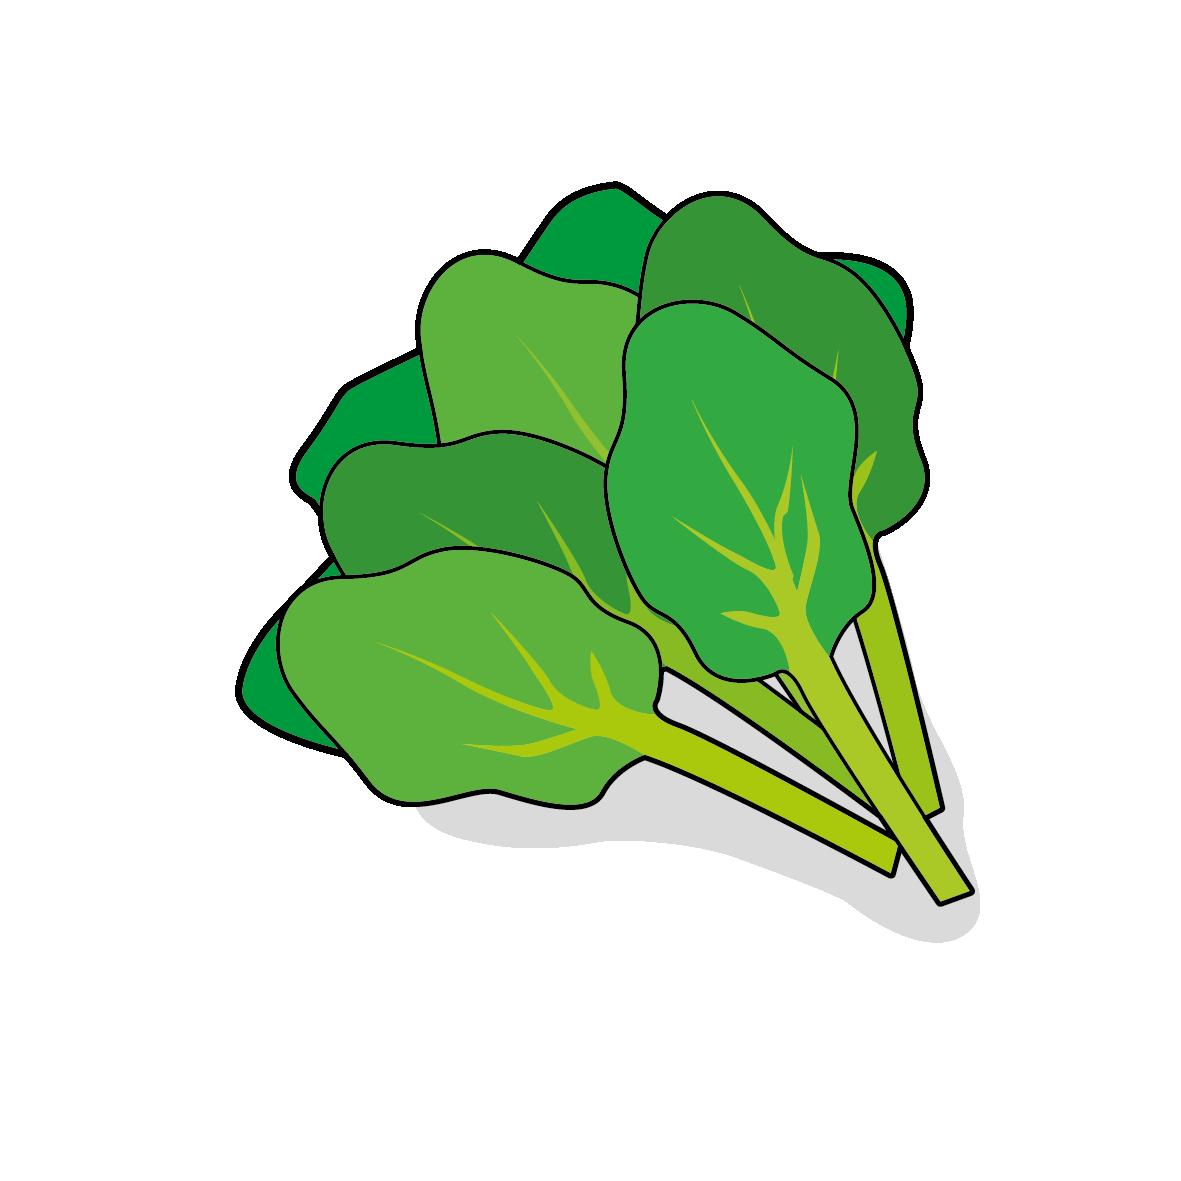 Icone d'épinards, ailmacocotte.com